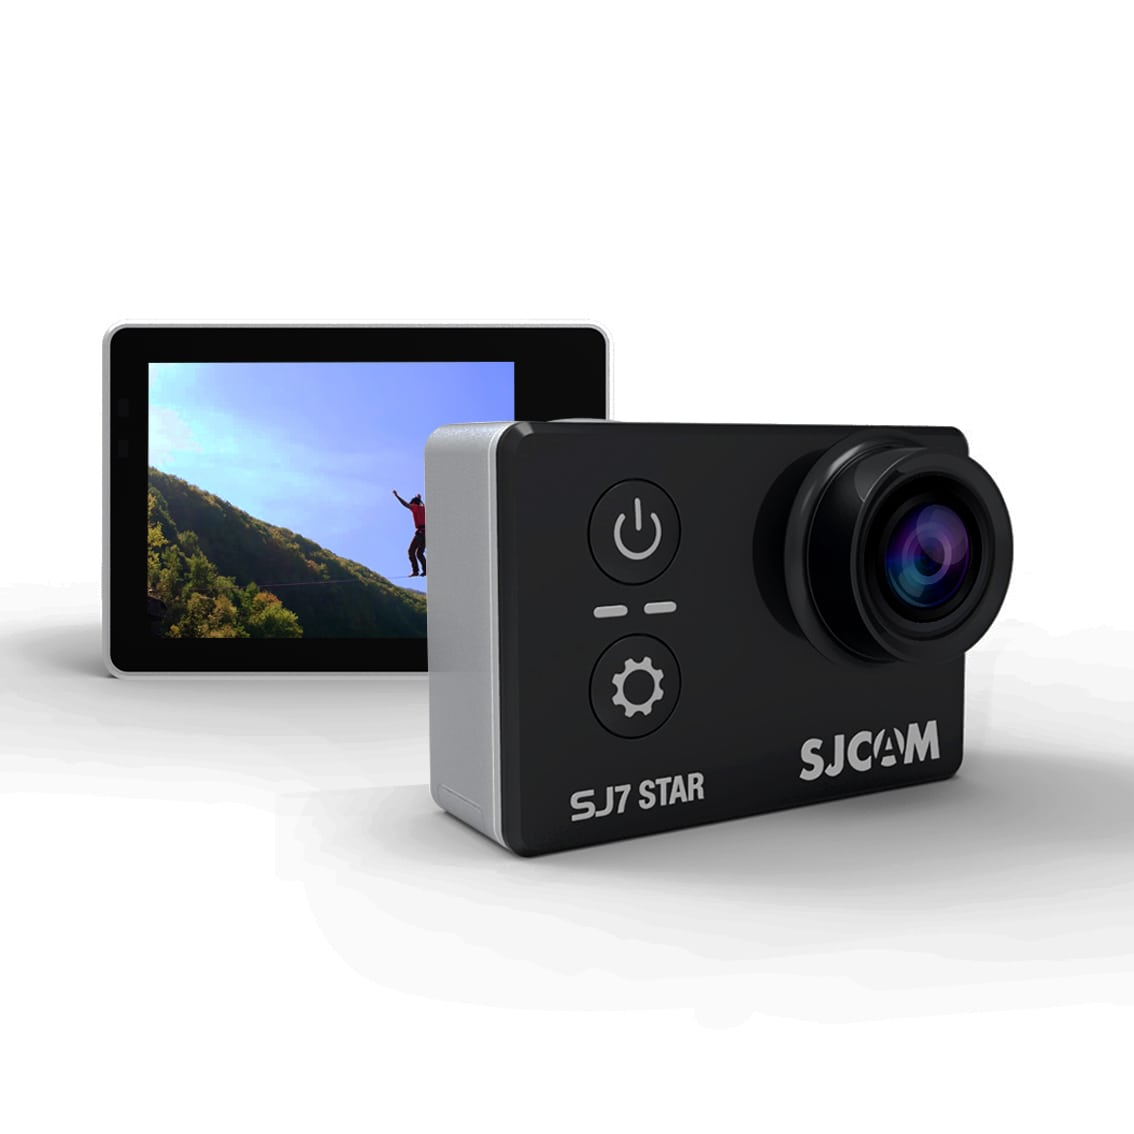 Sjcam Sj7 Star 4k Action Camera Phipps Electronics 0in Ultrahd Kamera